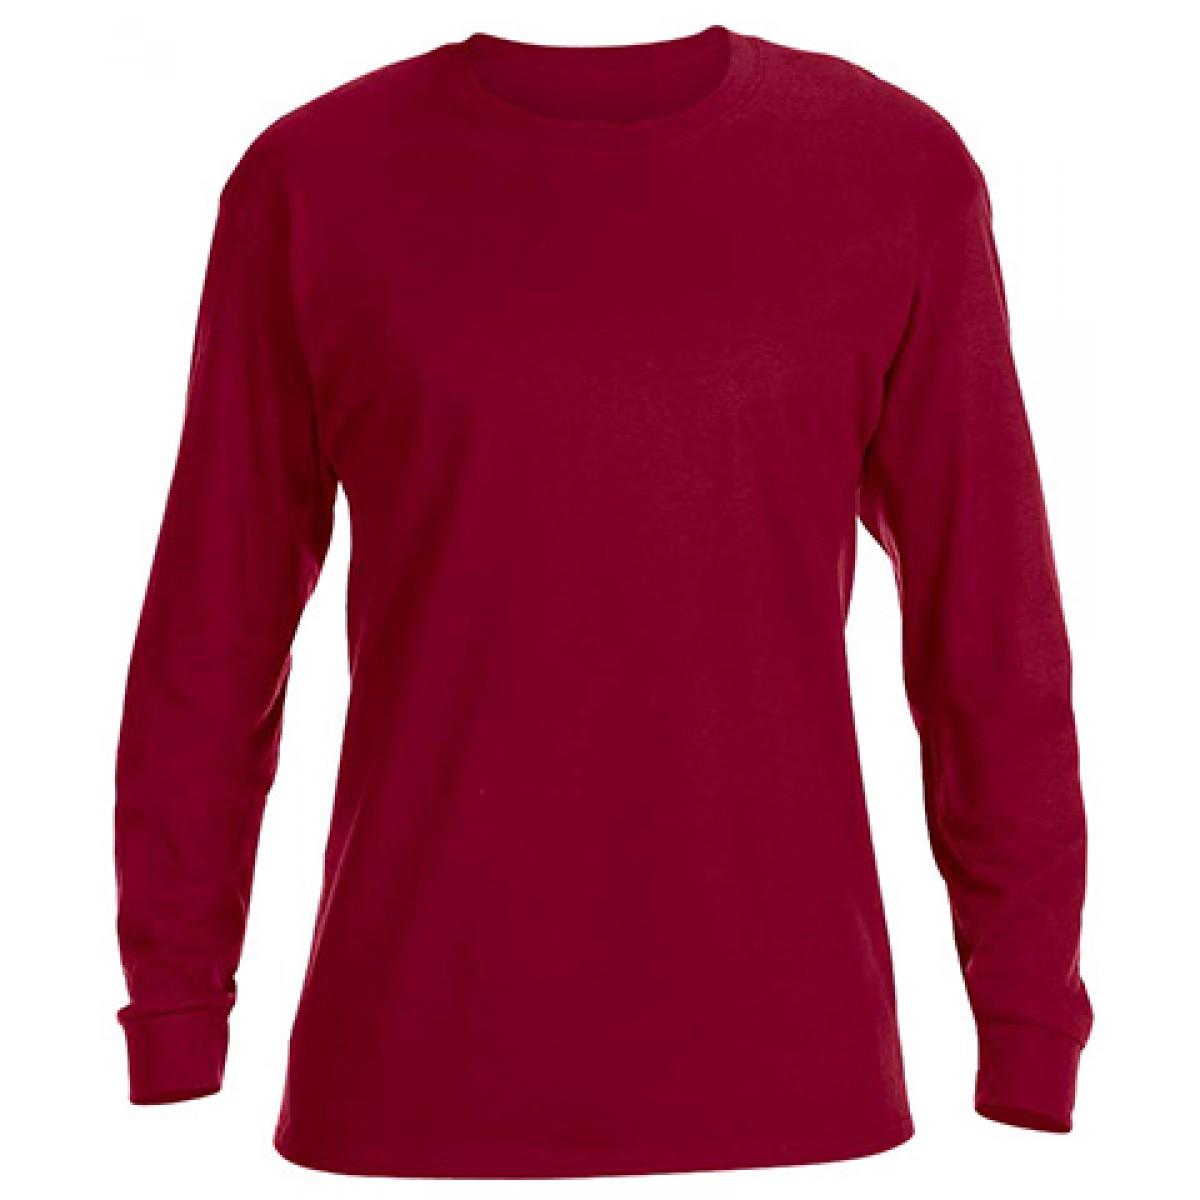 Basic Long Sleeve Crew Neck -Cardinal Red-L